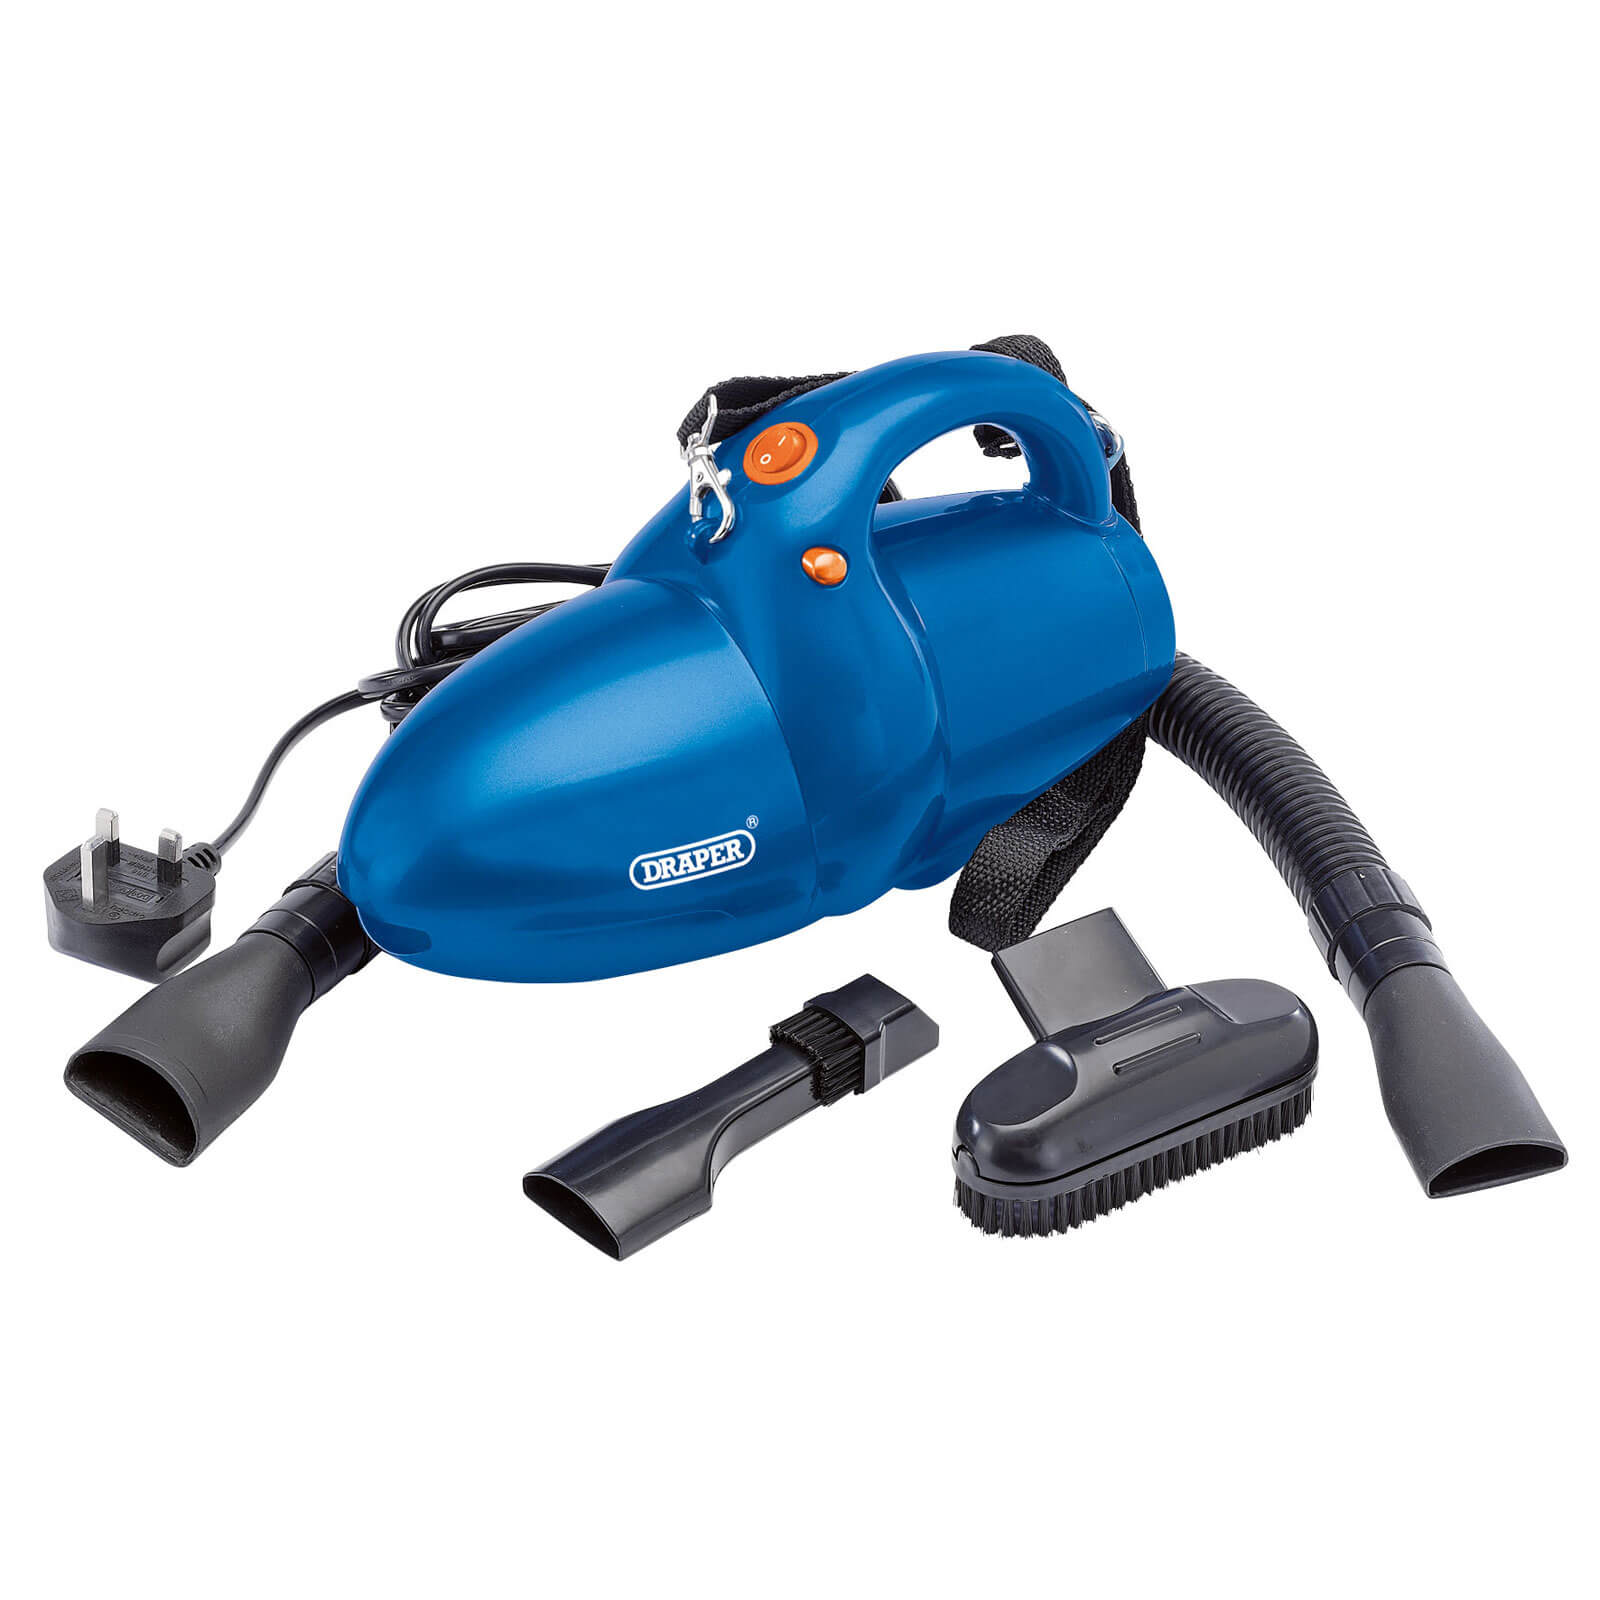 Draper Handheld Vacuum Cleaner 240v